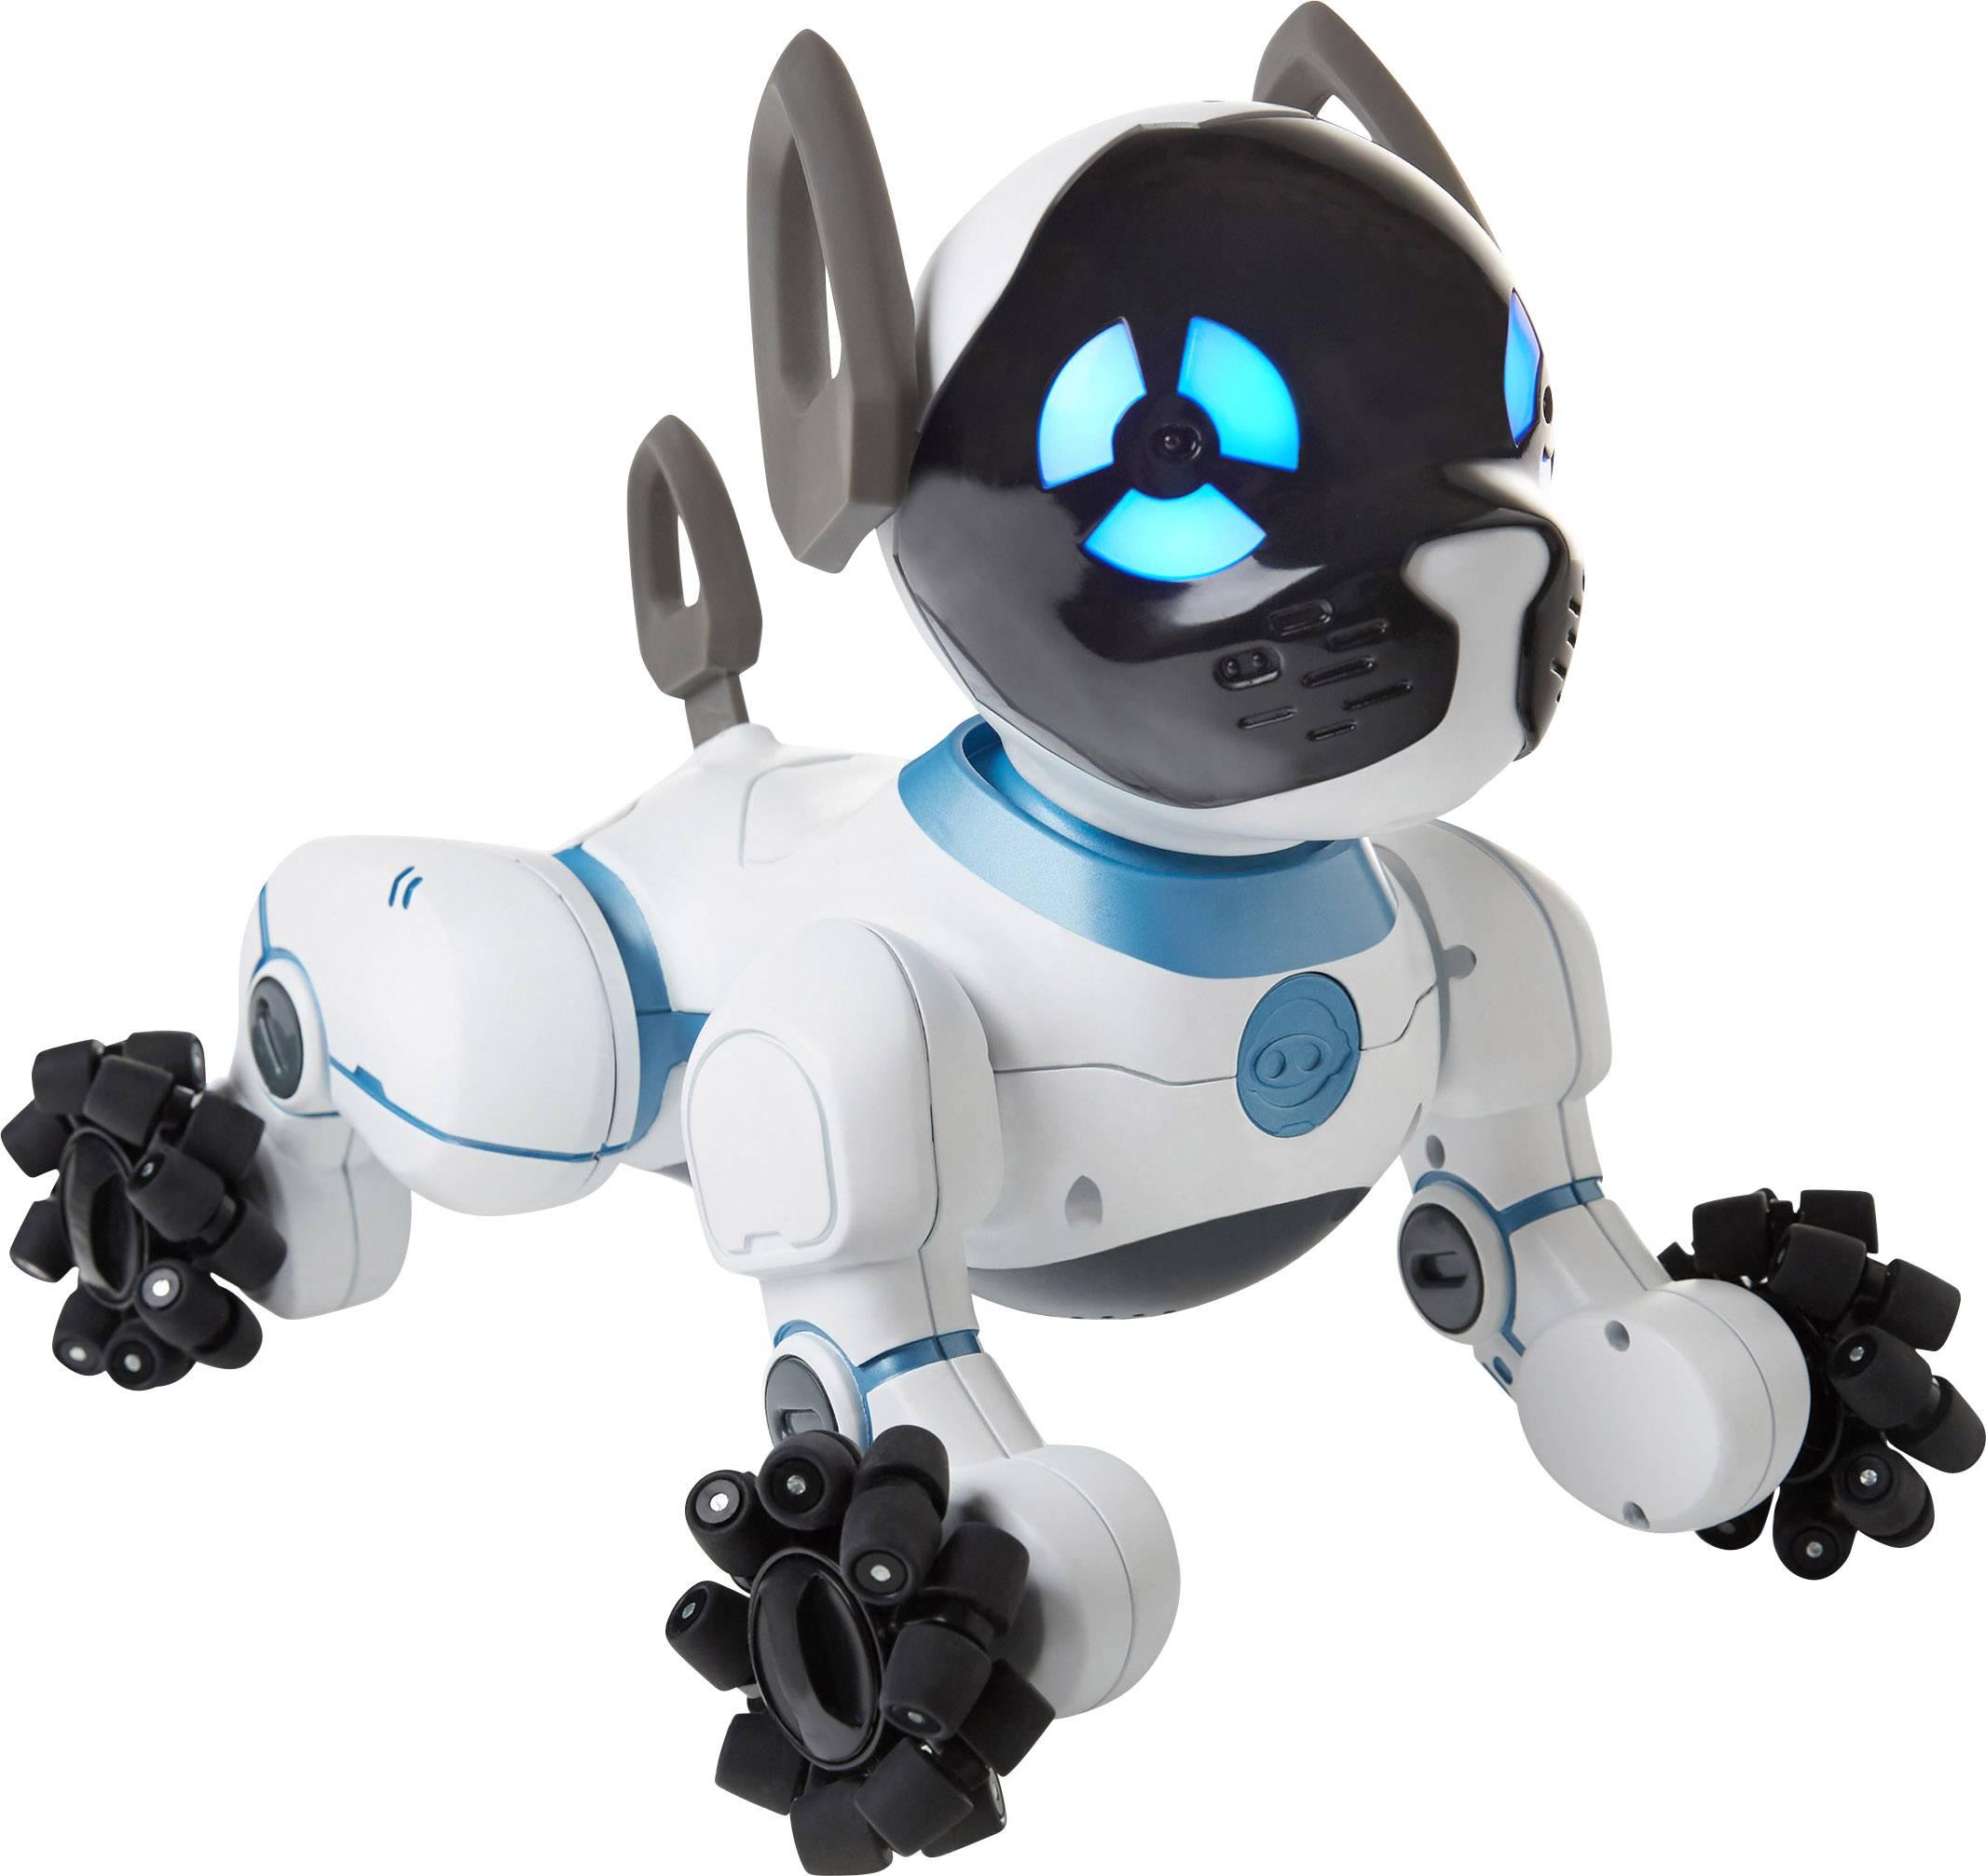 Robotická hračka WowWee Robotics CHIP Roboterhund